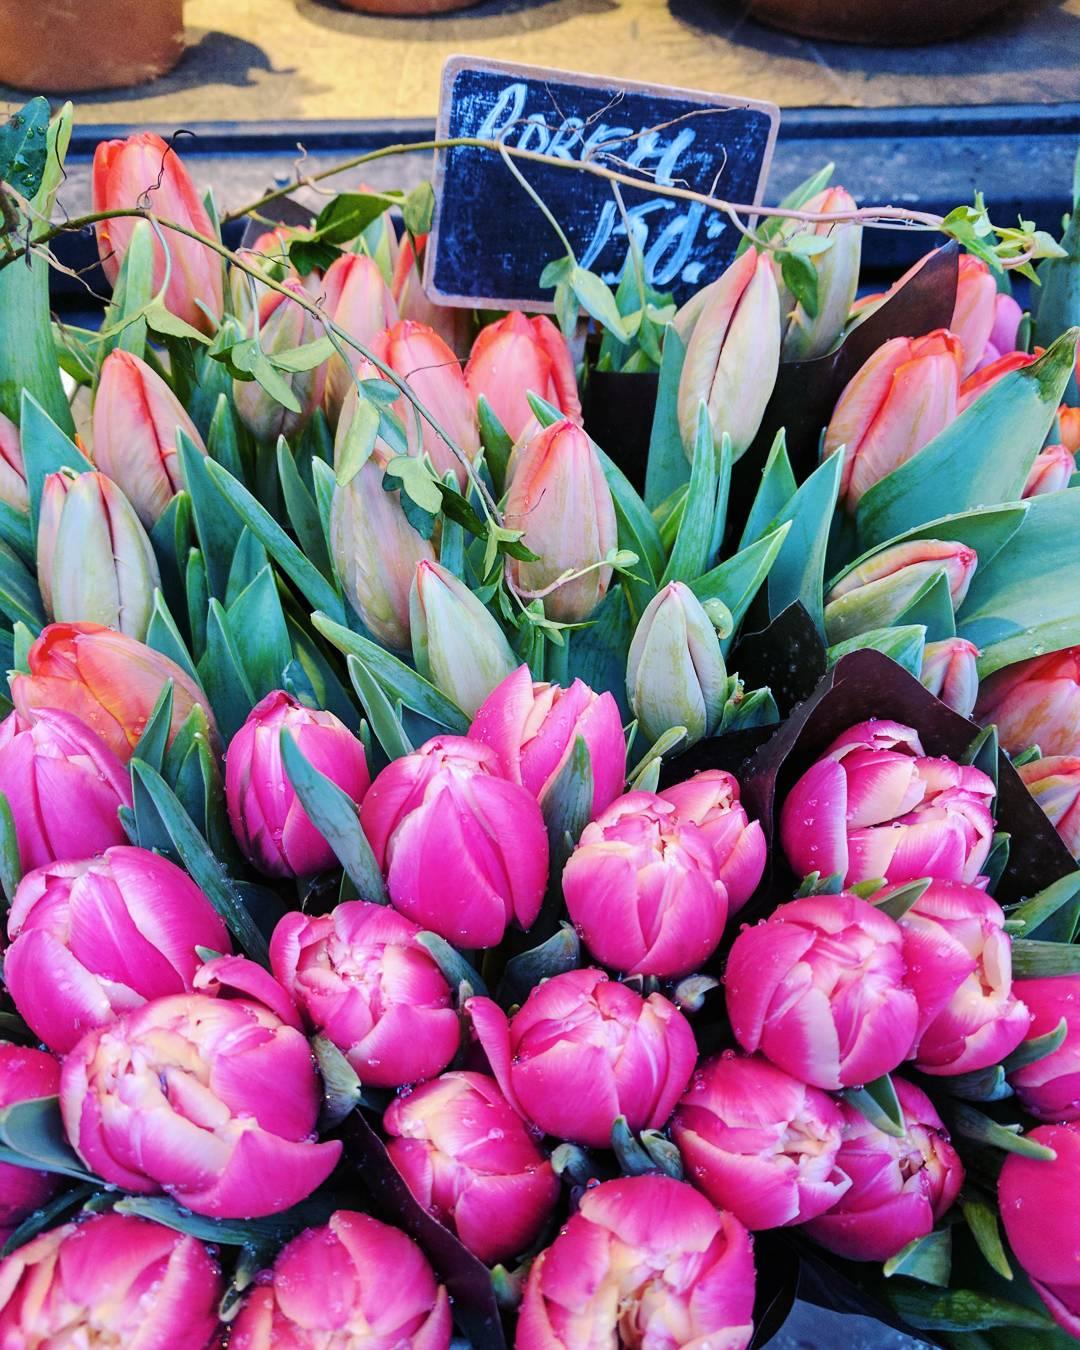 Fresh tulips in Stockholm